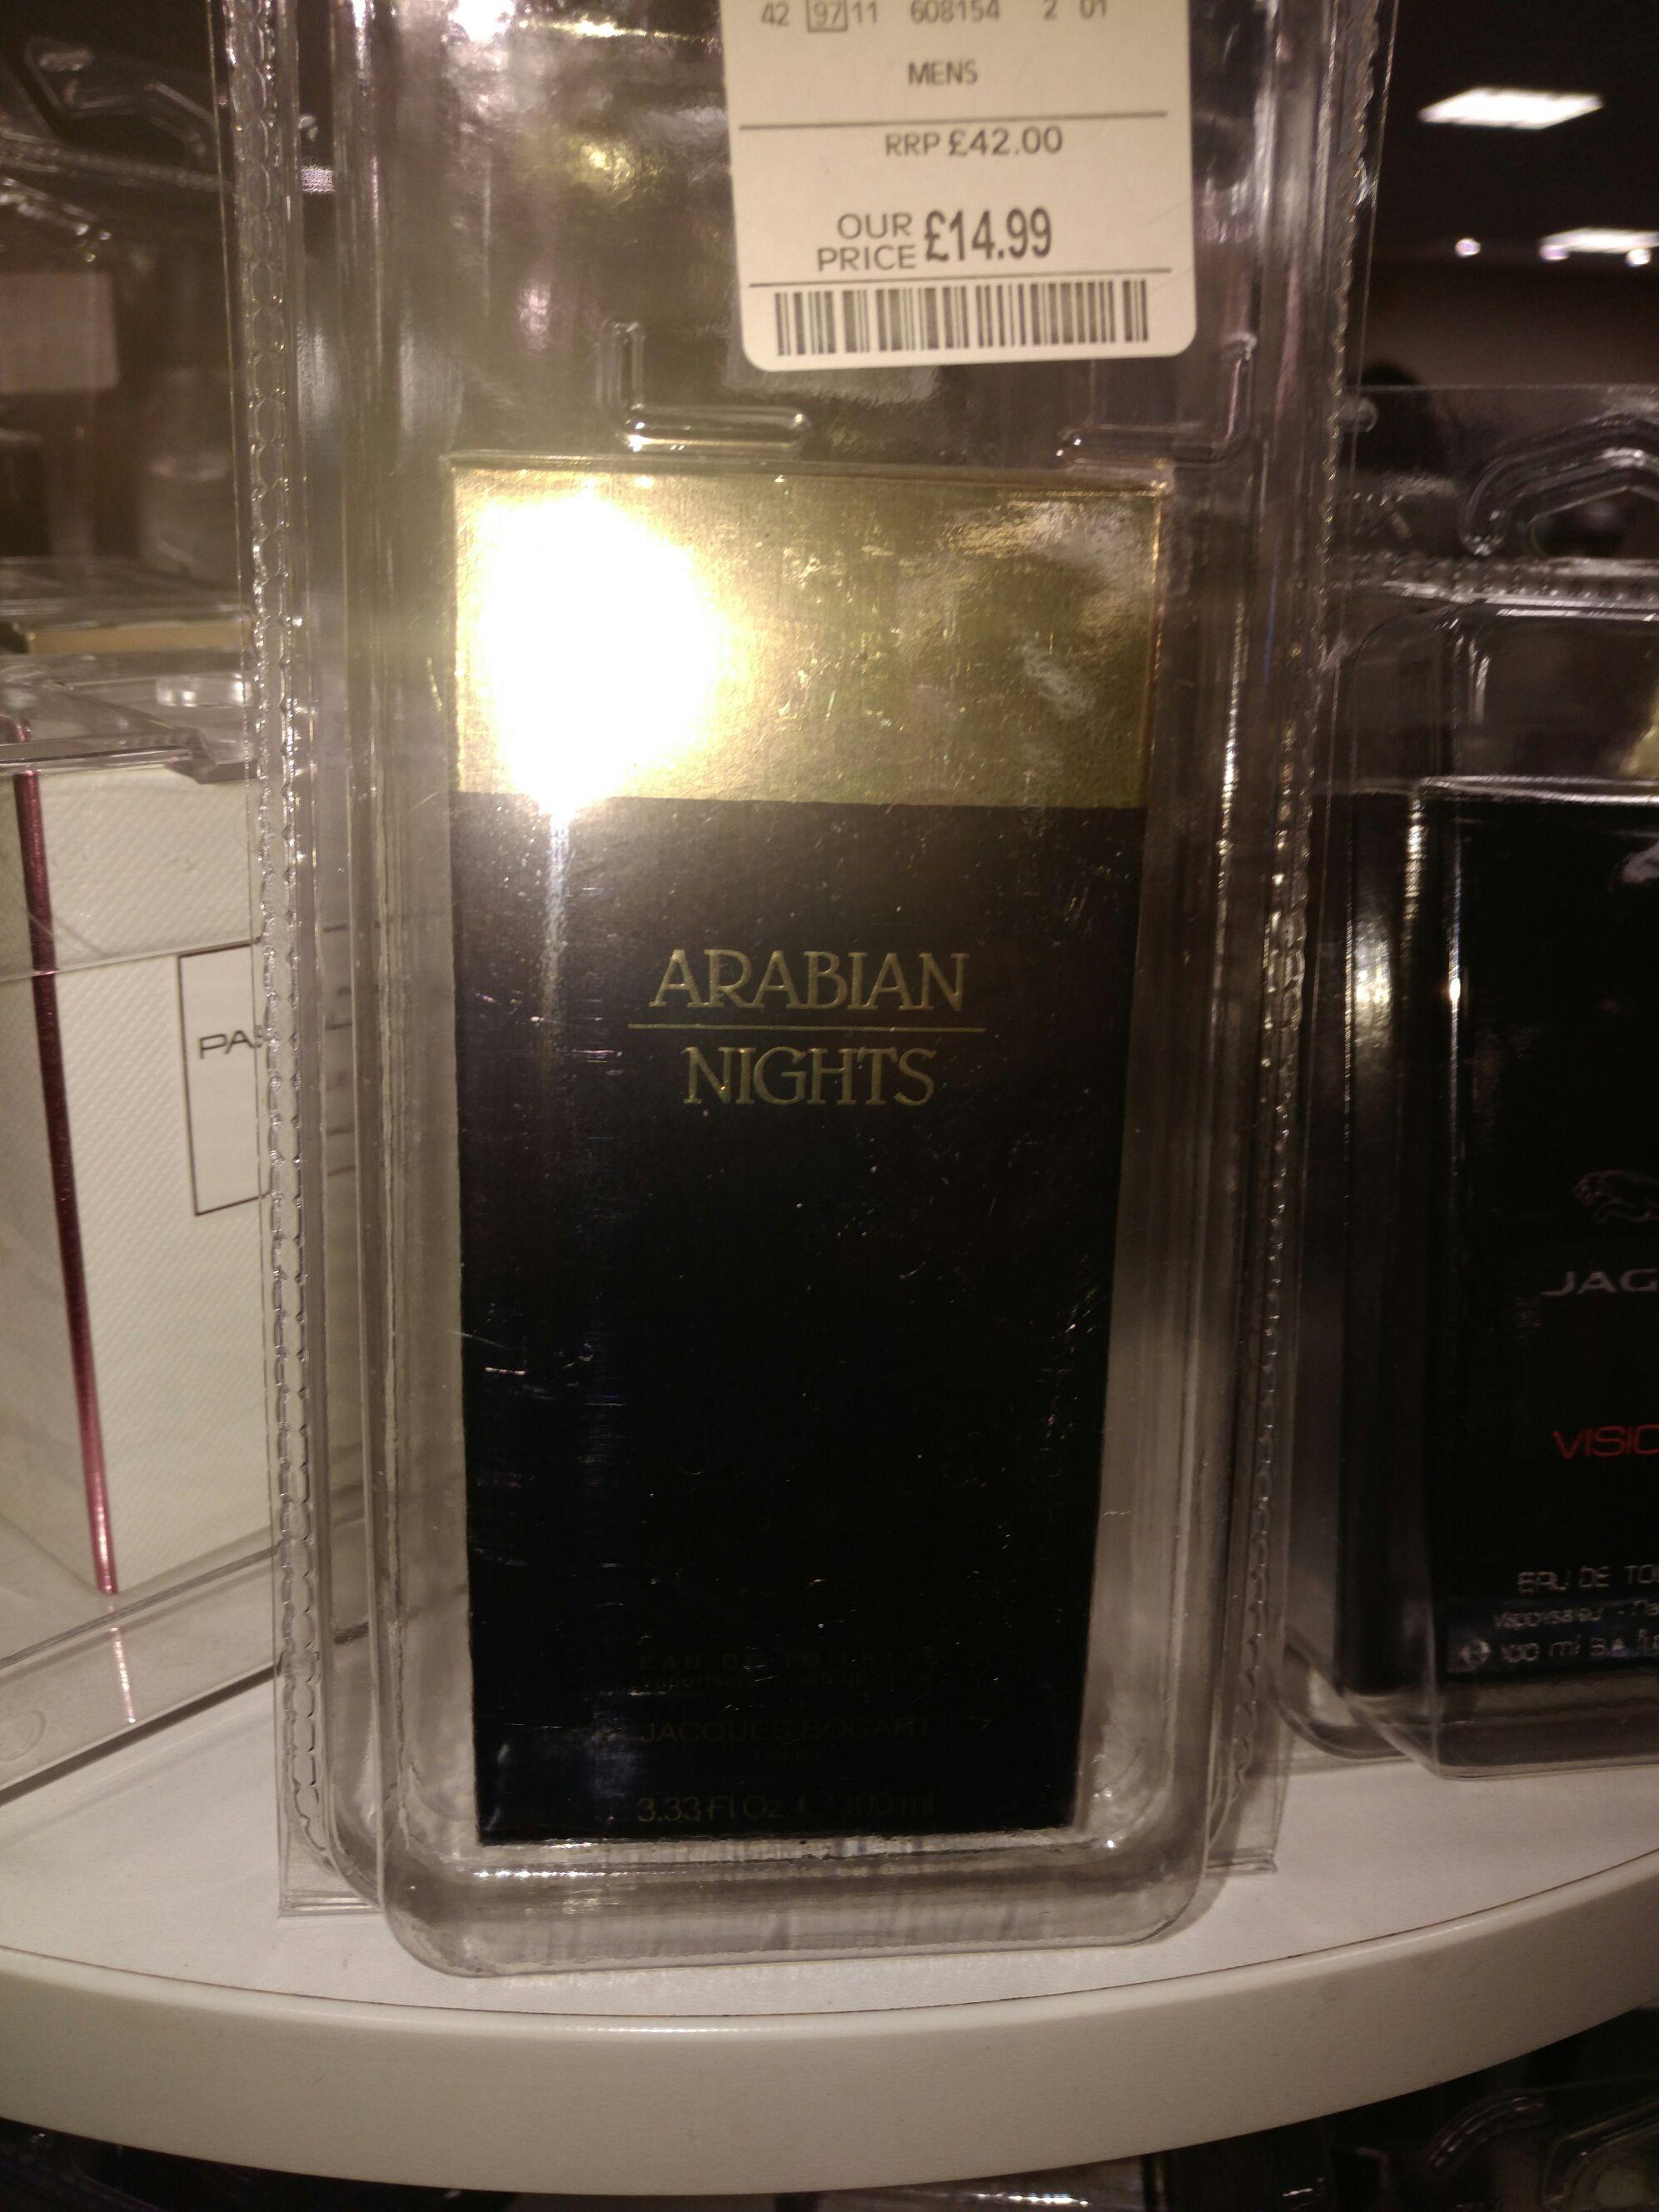 Arabian Nights Men's  EDT tkmaxx instore £14.99 100ml